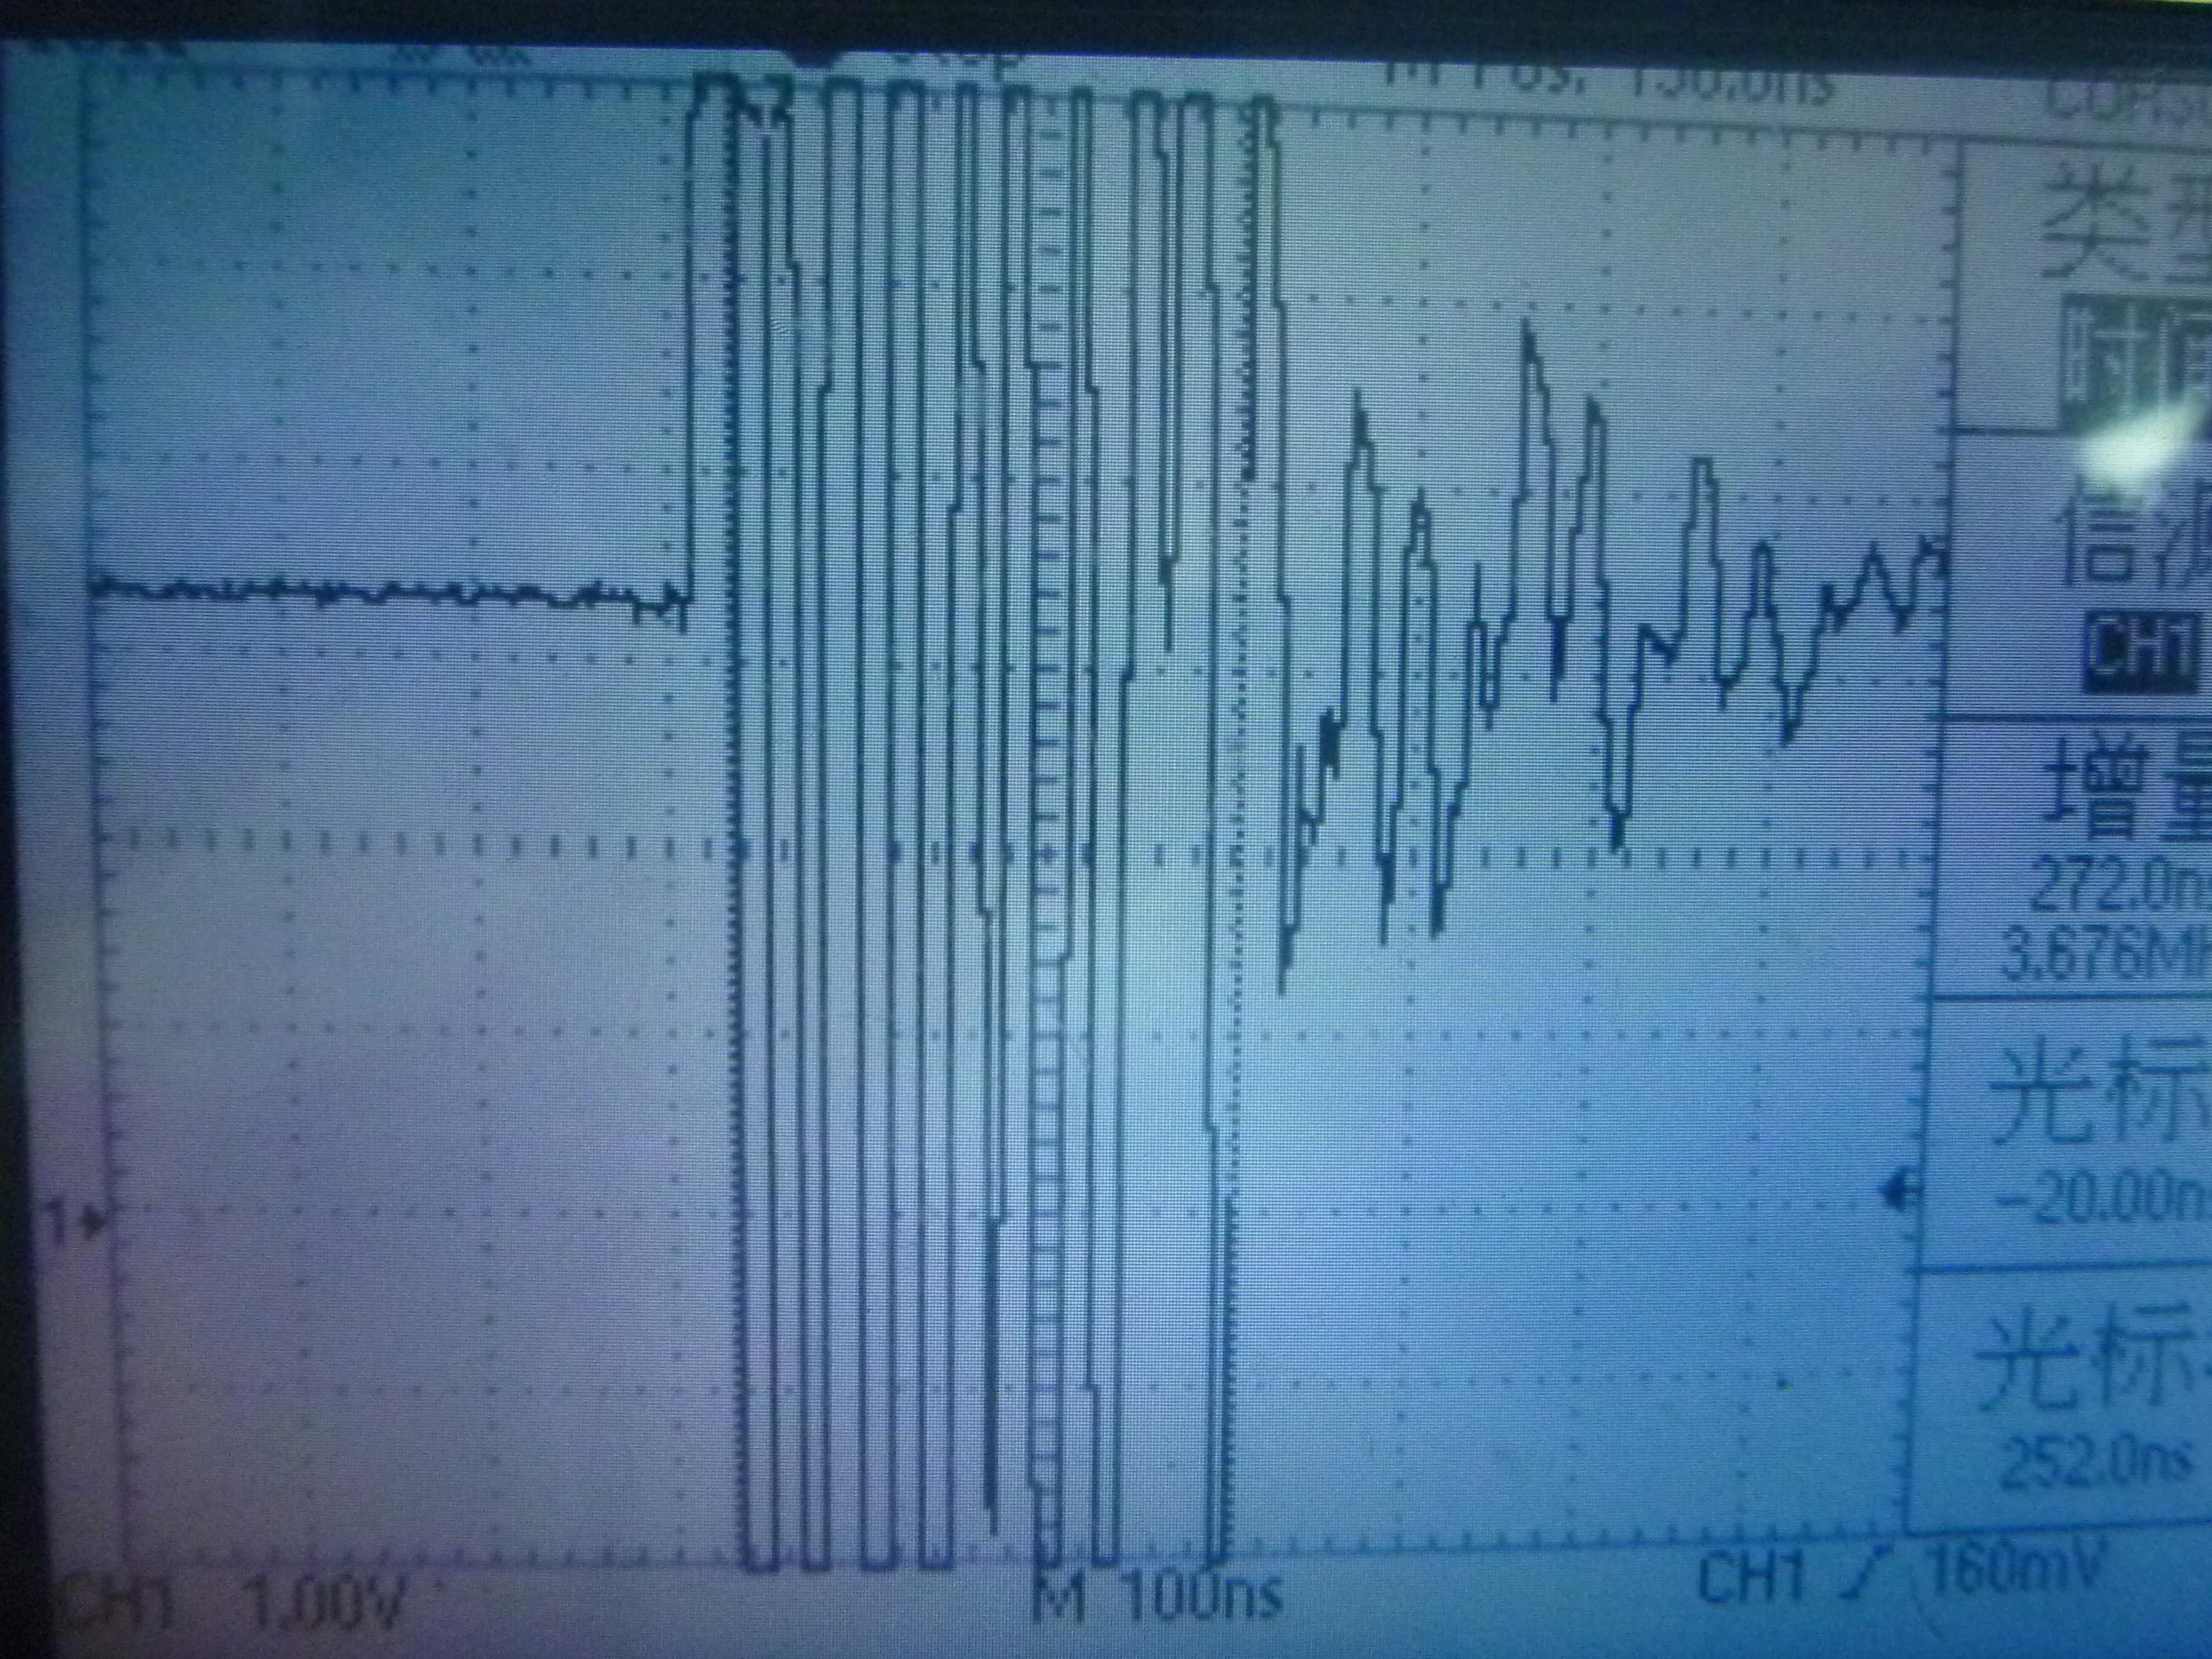 进行dc/dc转换成dc5v,这个5v电源是mcu外围电路用到